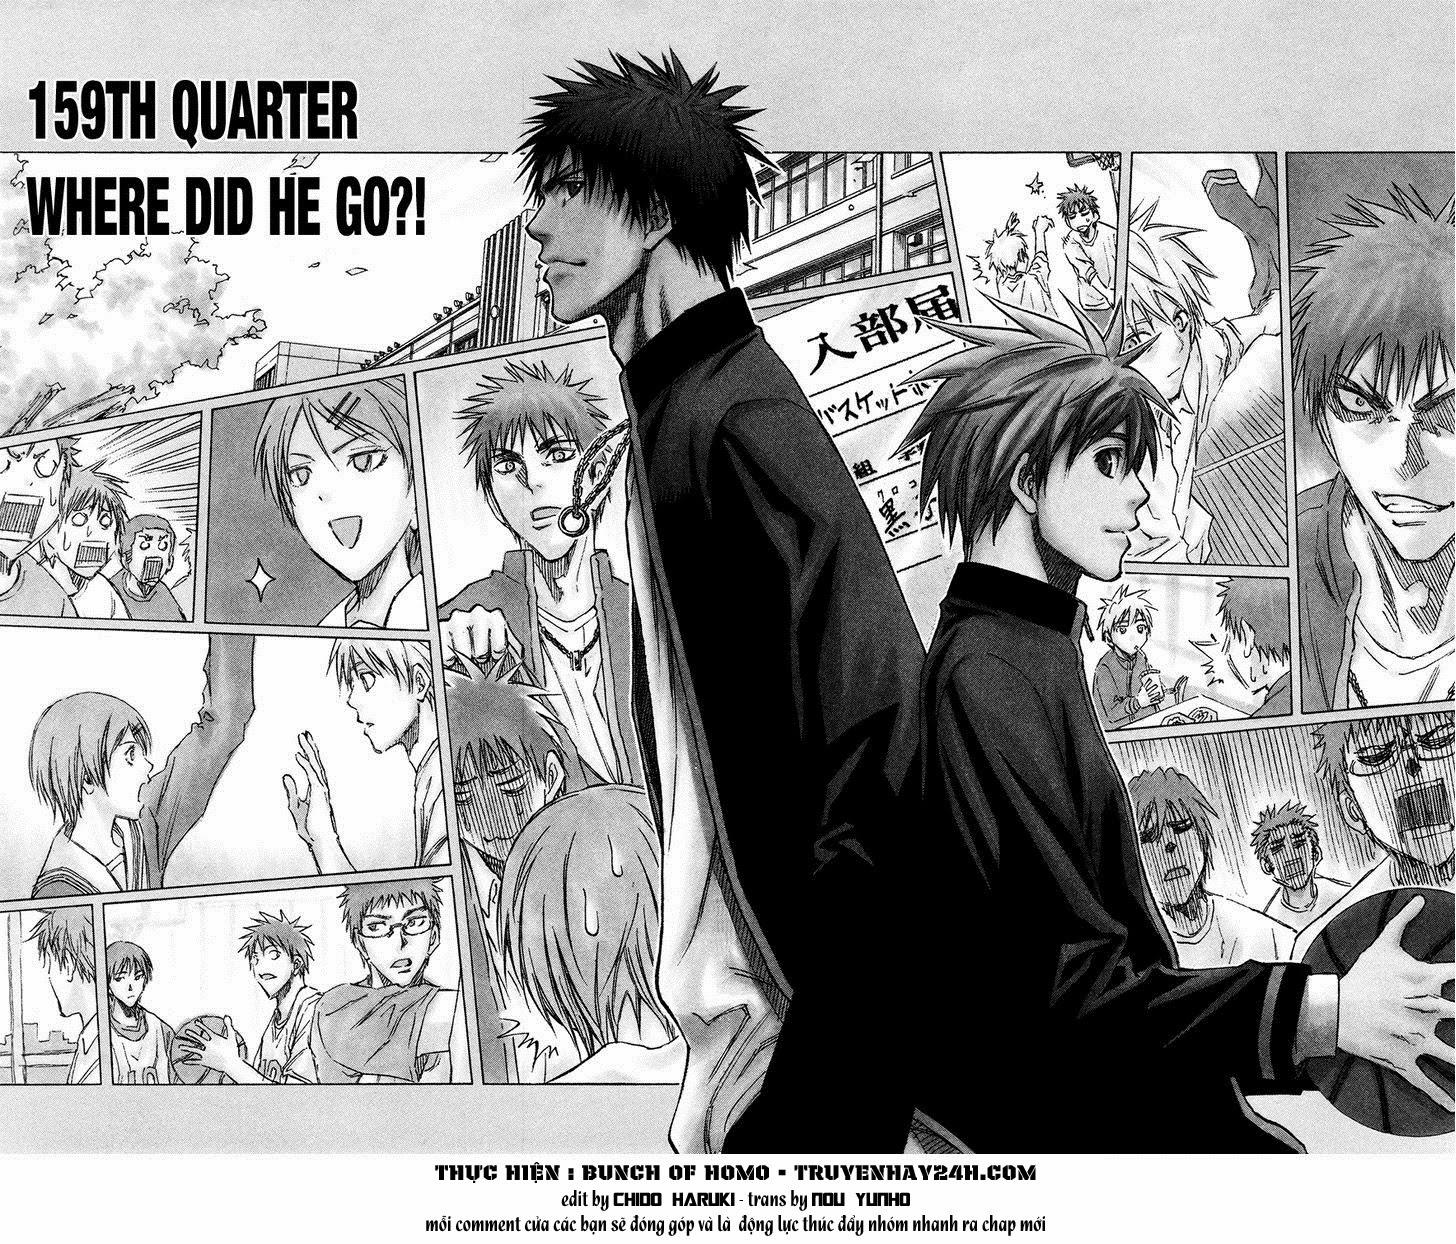 Kuroko No Basket chap 159 trang 2